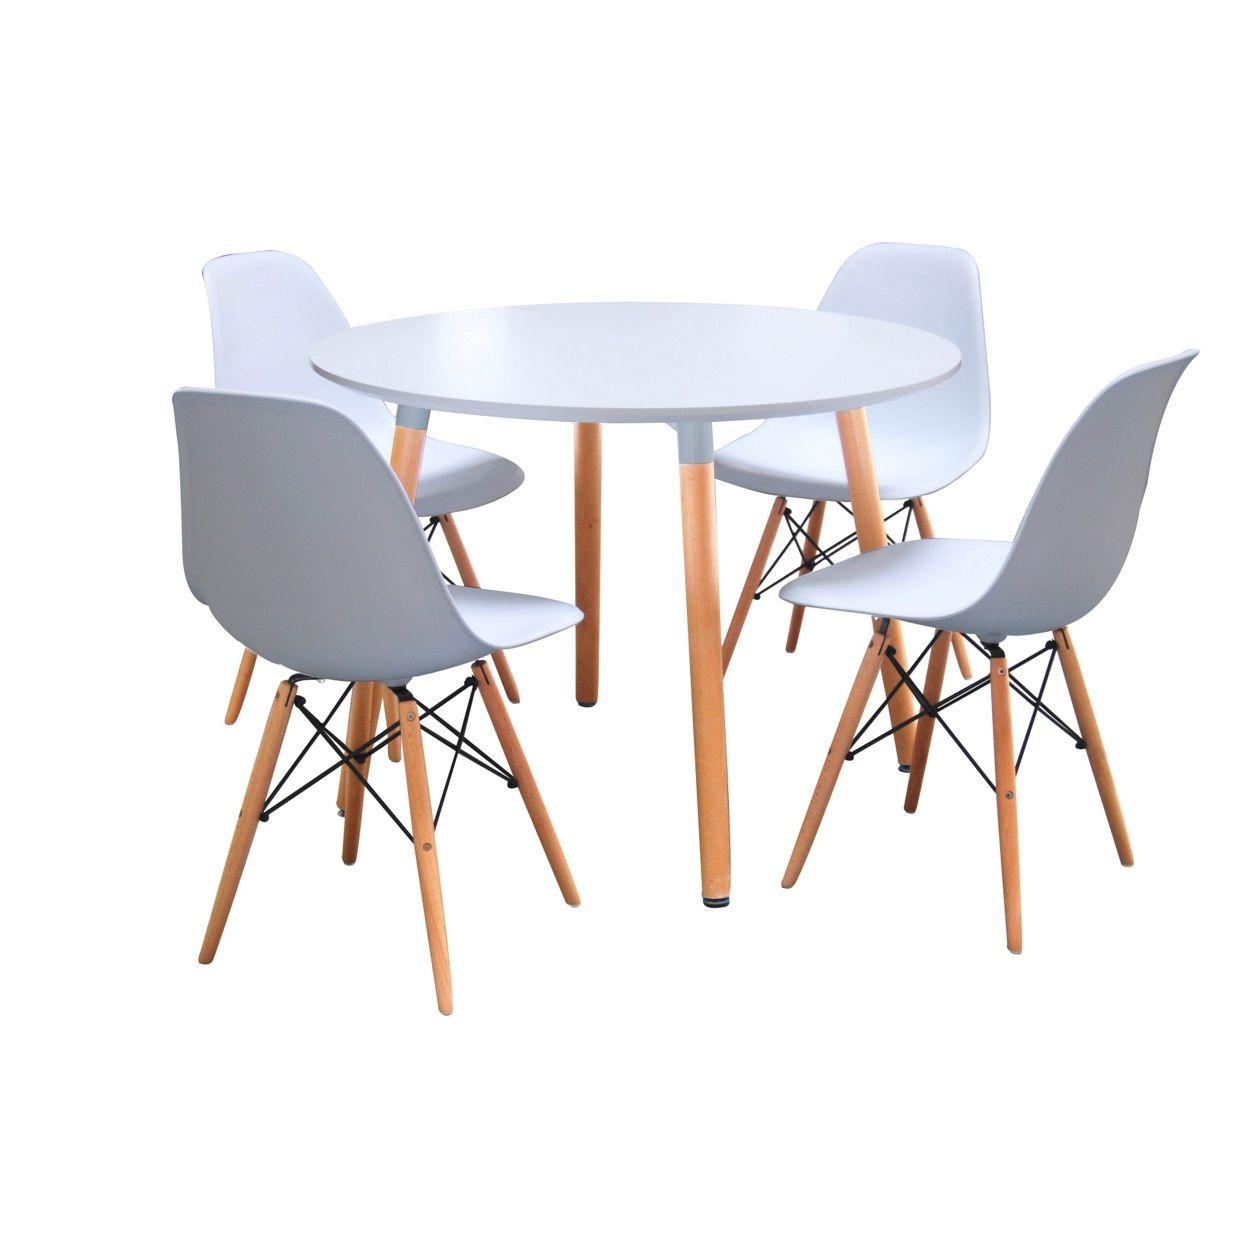 Debenhams Pair Of White Avignon Dining Chairs At Debenhamsie